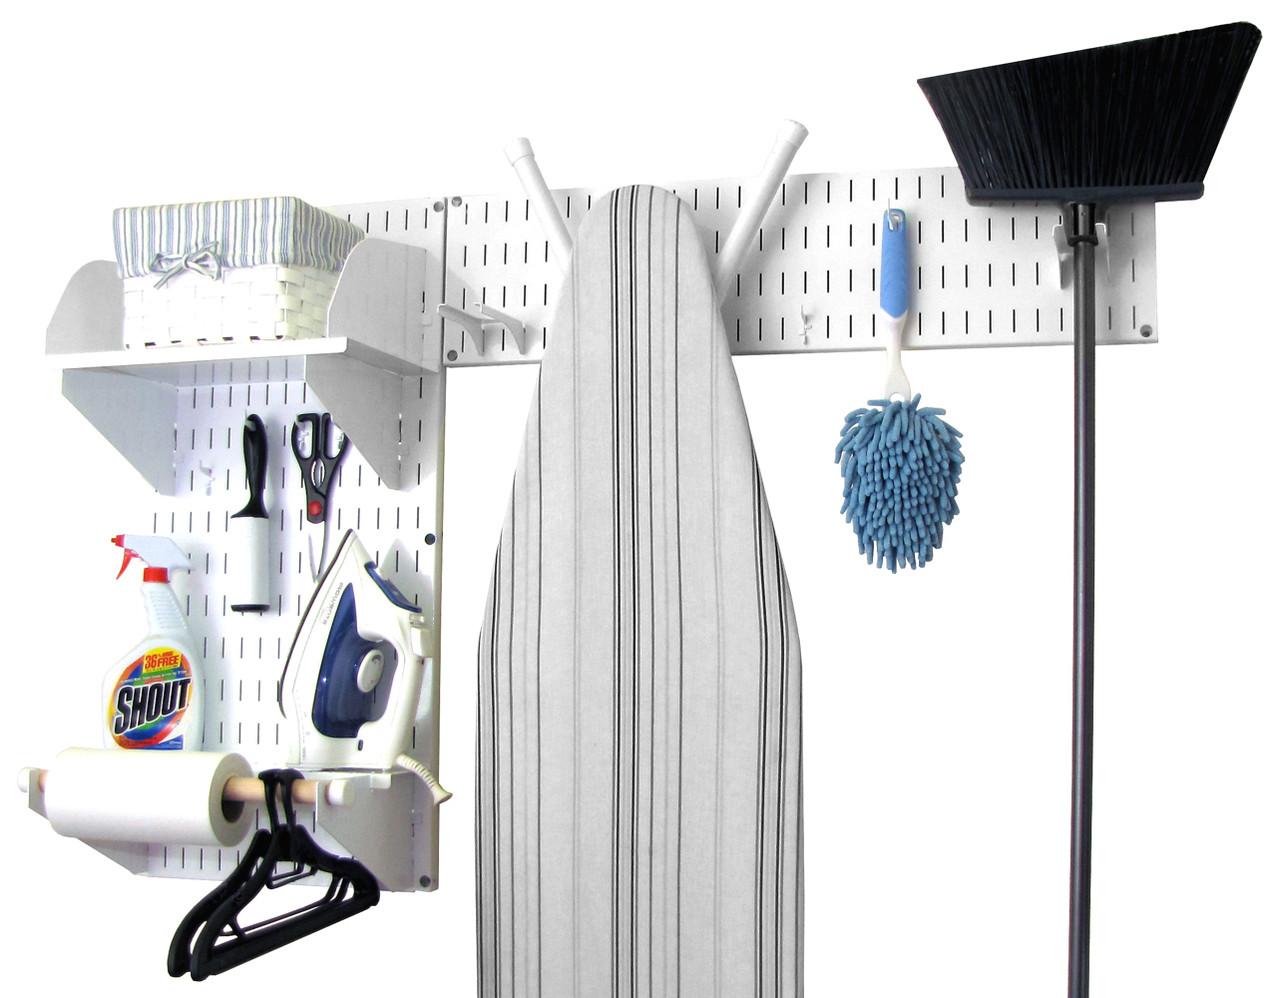 Laundry Room Wall Organizer | Closet Wall Organizer Kit | 10-LAU-200 ...